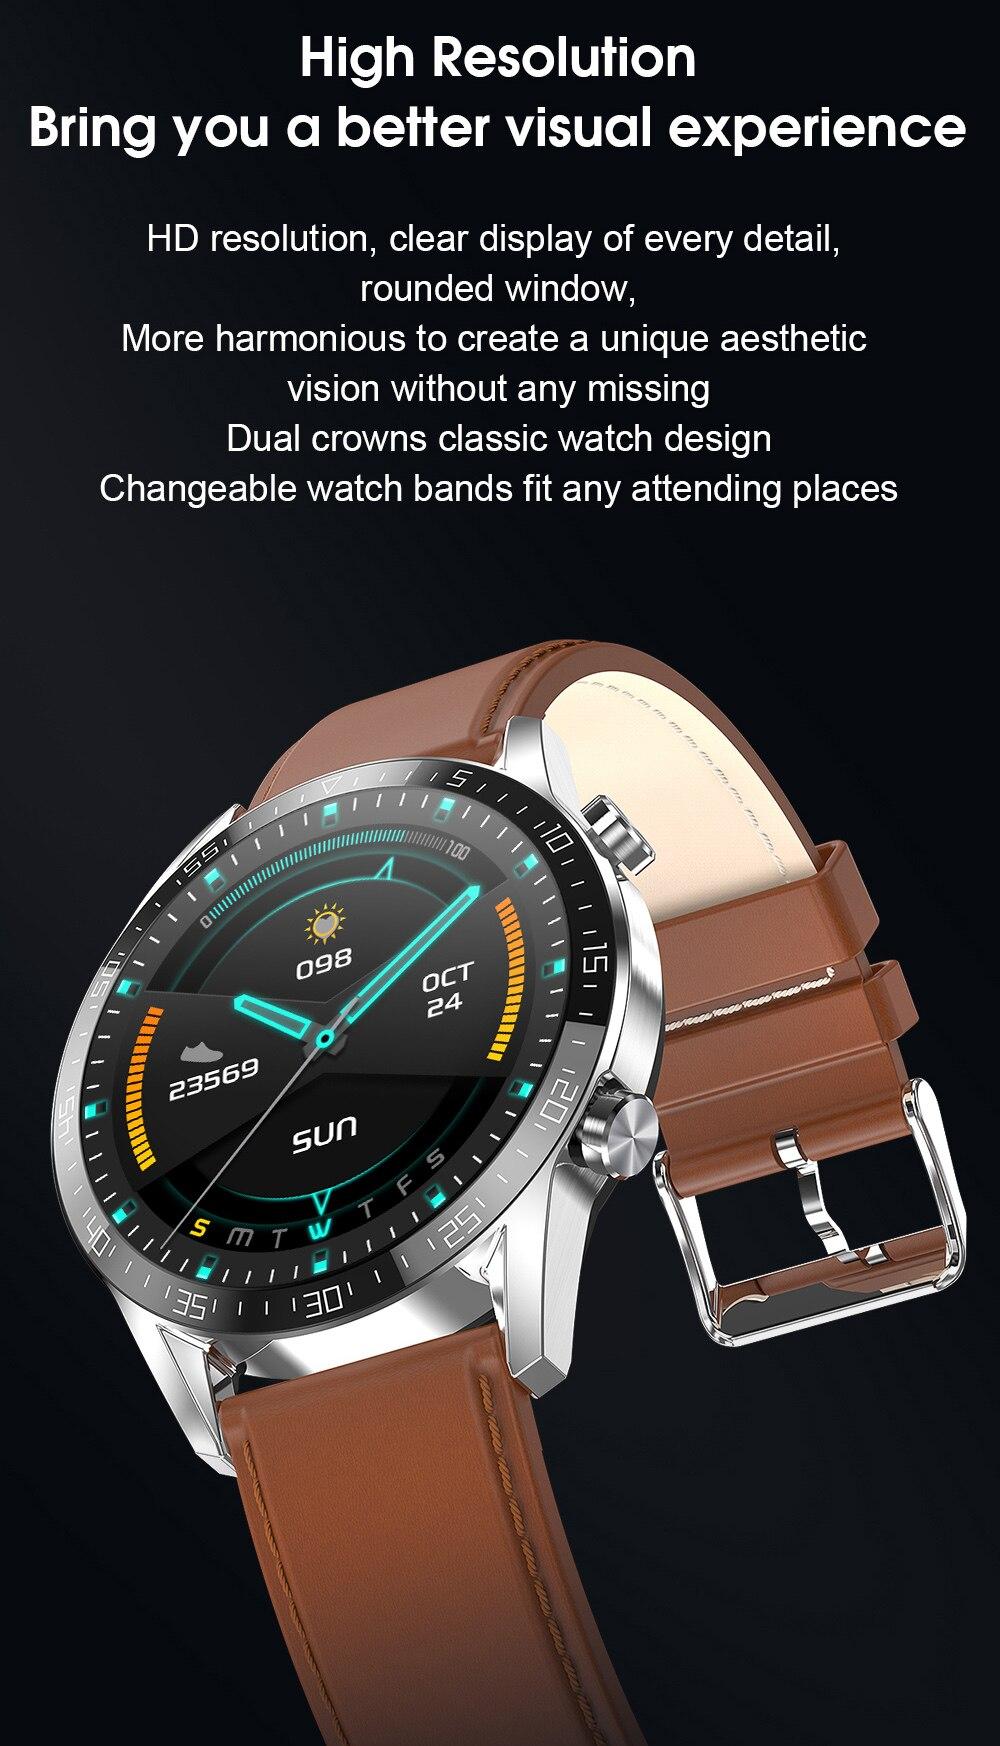 He7010298122c400284ce39b5007329eb4 IPbzhe Smart Watch Men Thermometer ECG Smart Watch IP68 Waterproof Blood Pressure Smartwatch Reloj Inteligente For Huawei Xiaomi